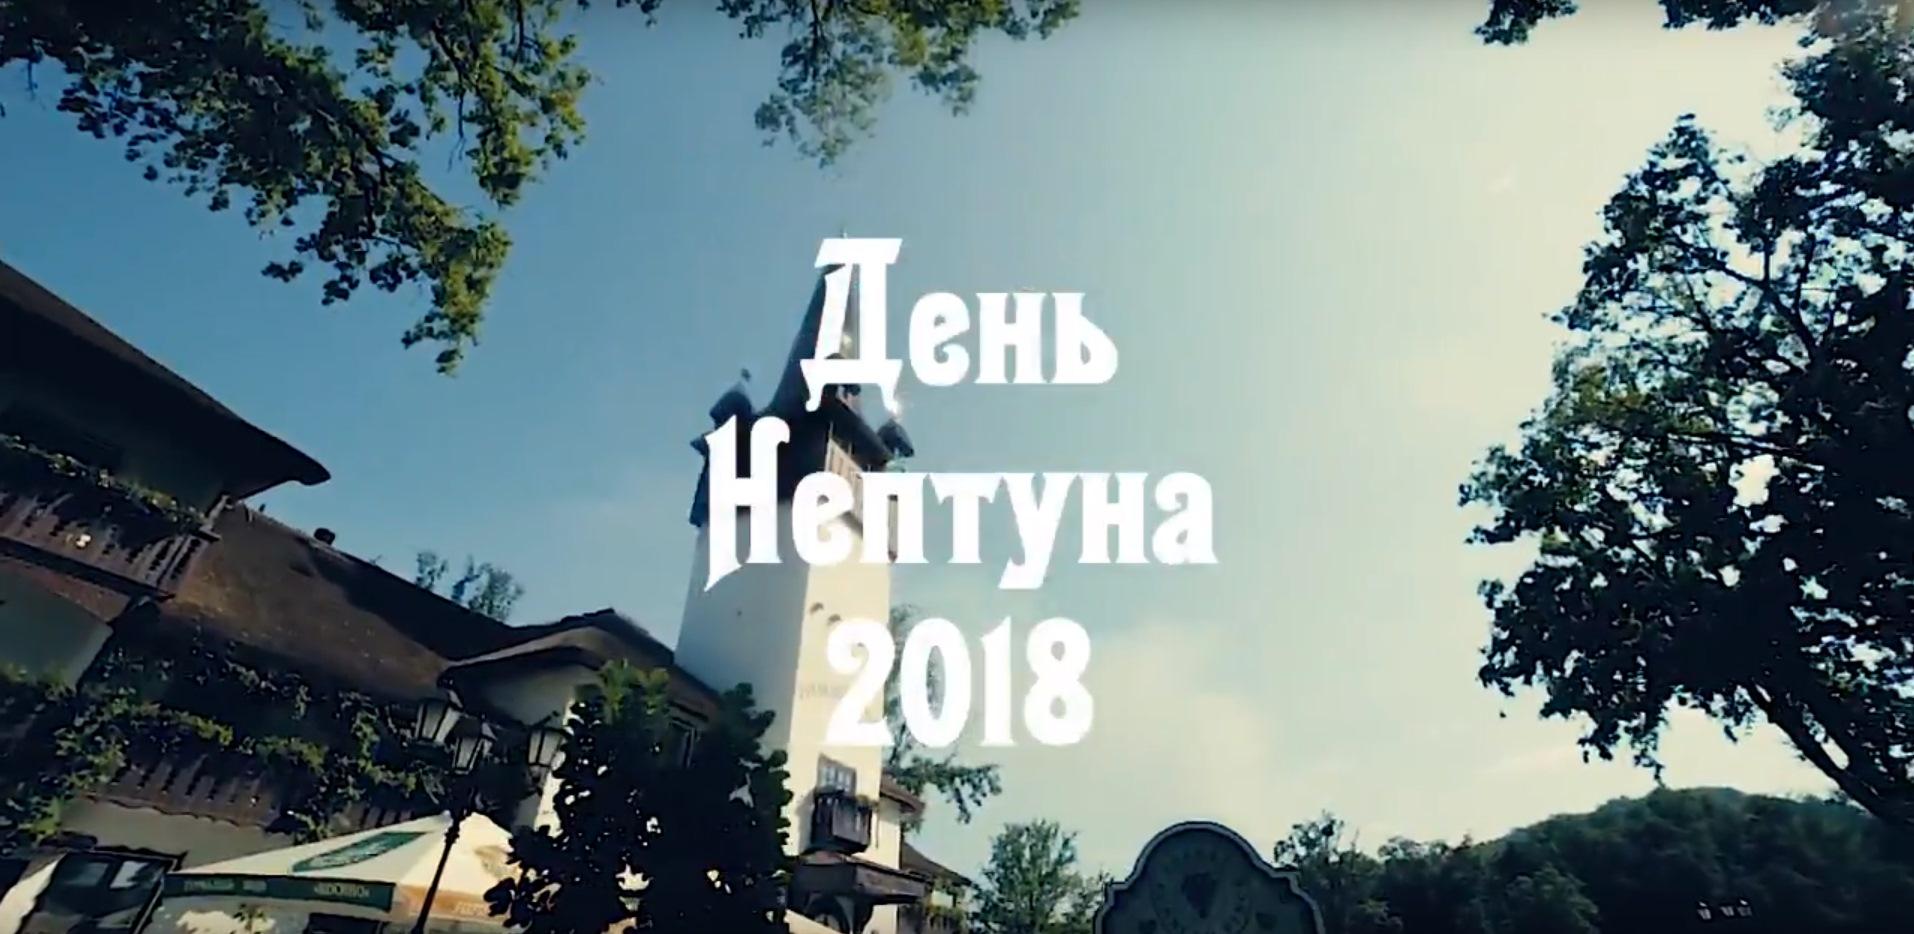 Neptun napja 2018-ban Kosinóban!